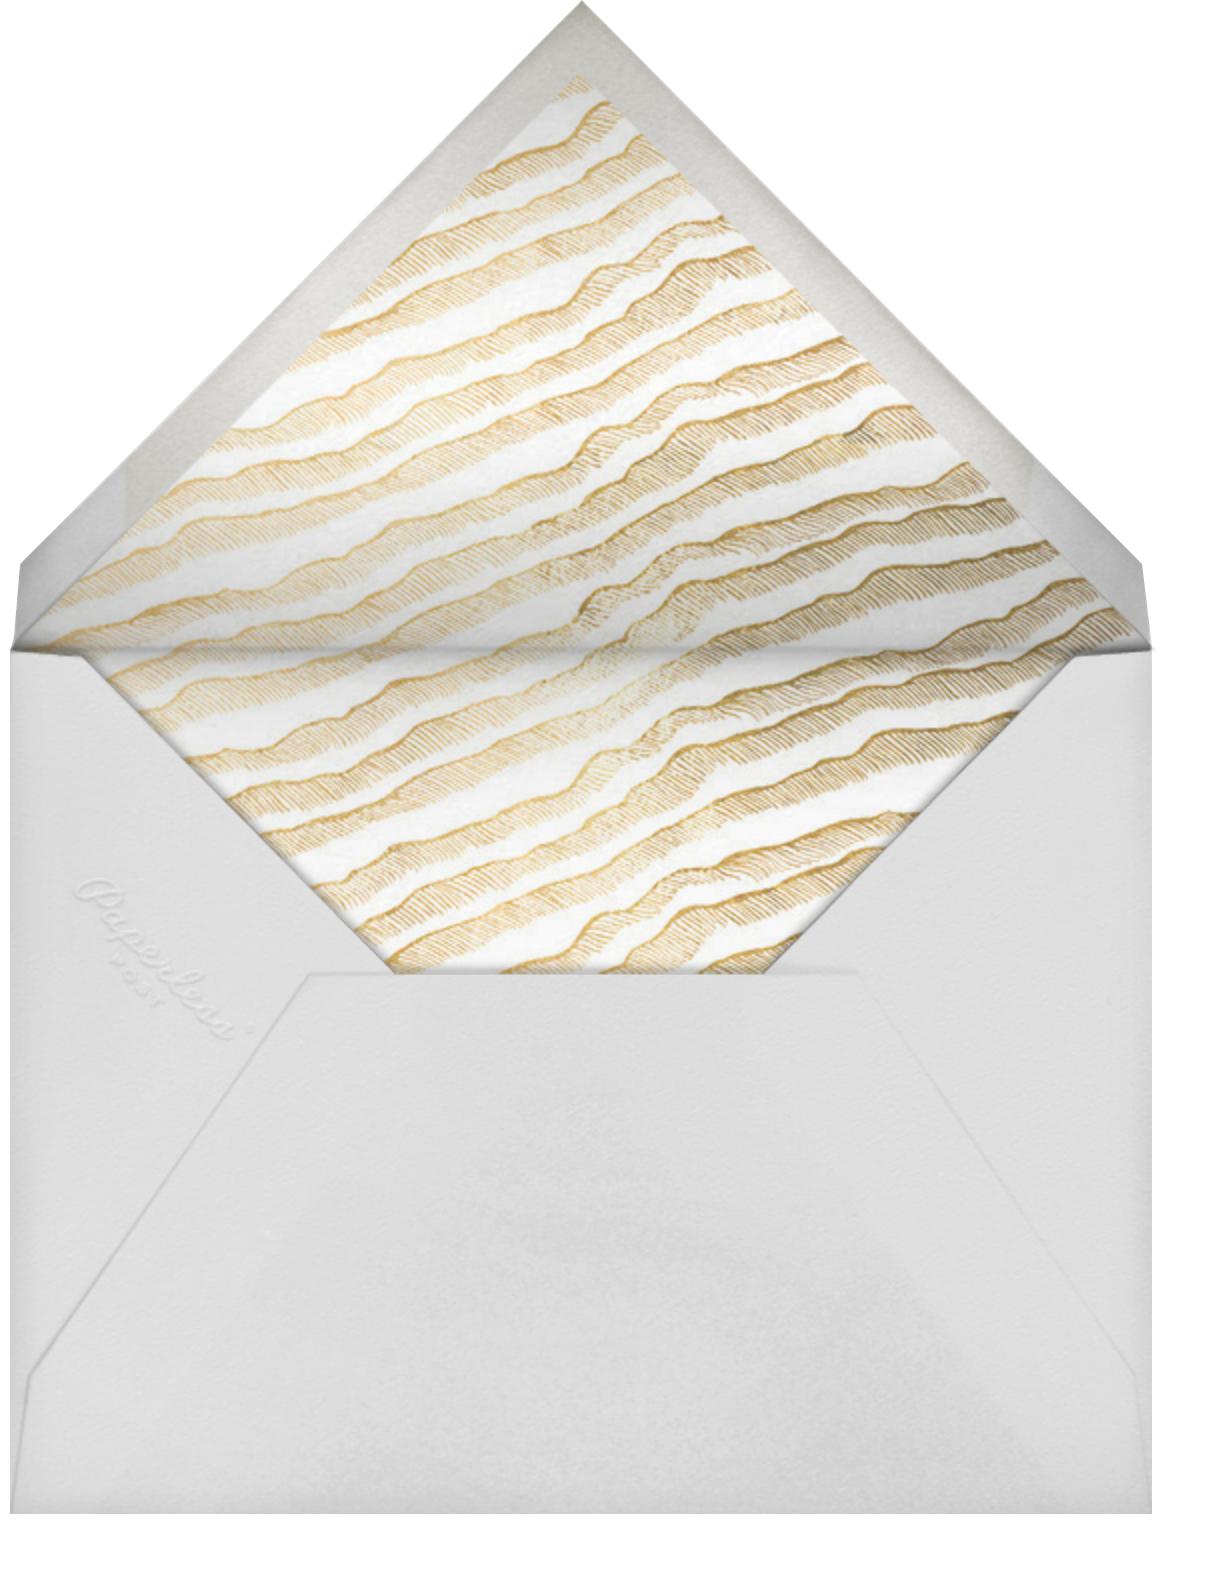 Divot - Amazon - Kelly Wearstler - Save the date - envelope back